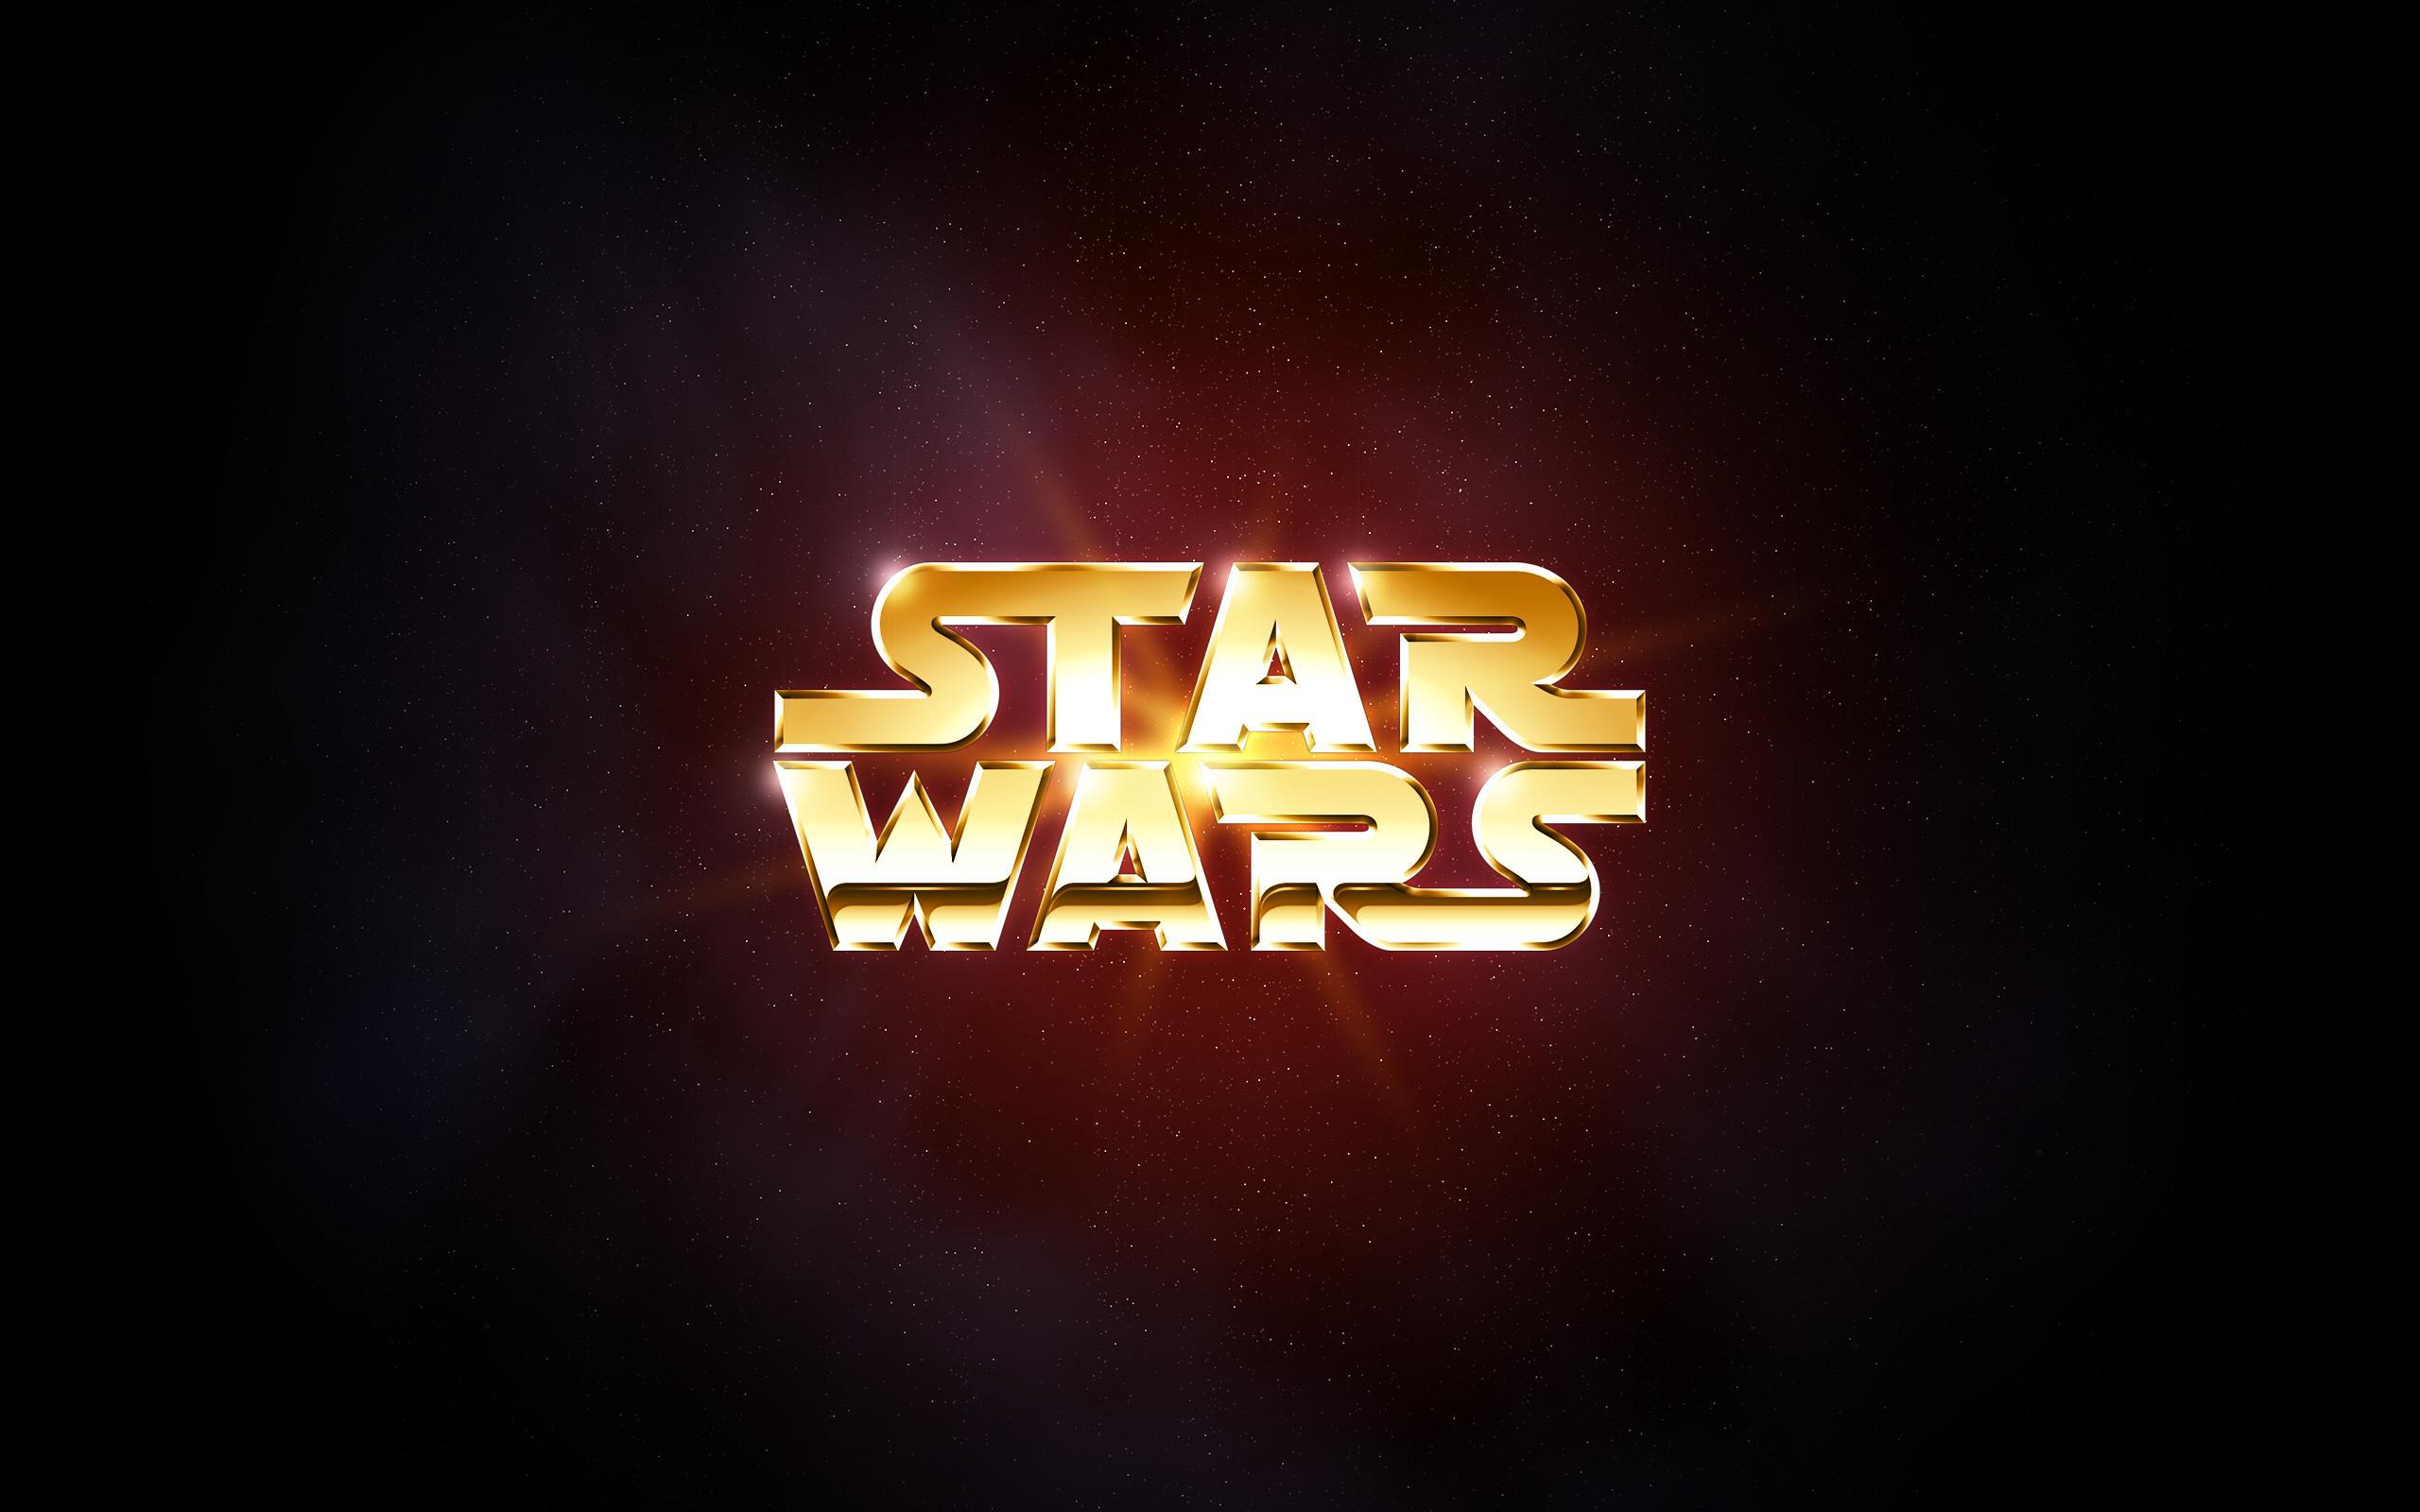 Kylo Ren Star Wars Lightsaber 4k Hd Desktop Wallpaper